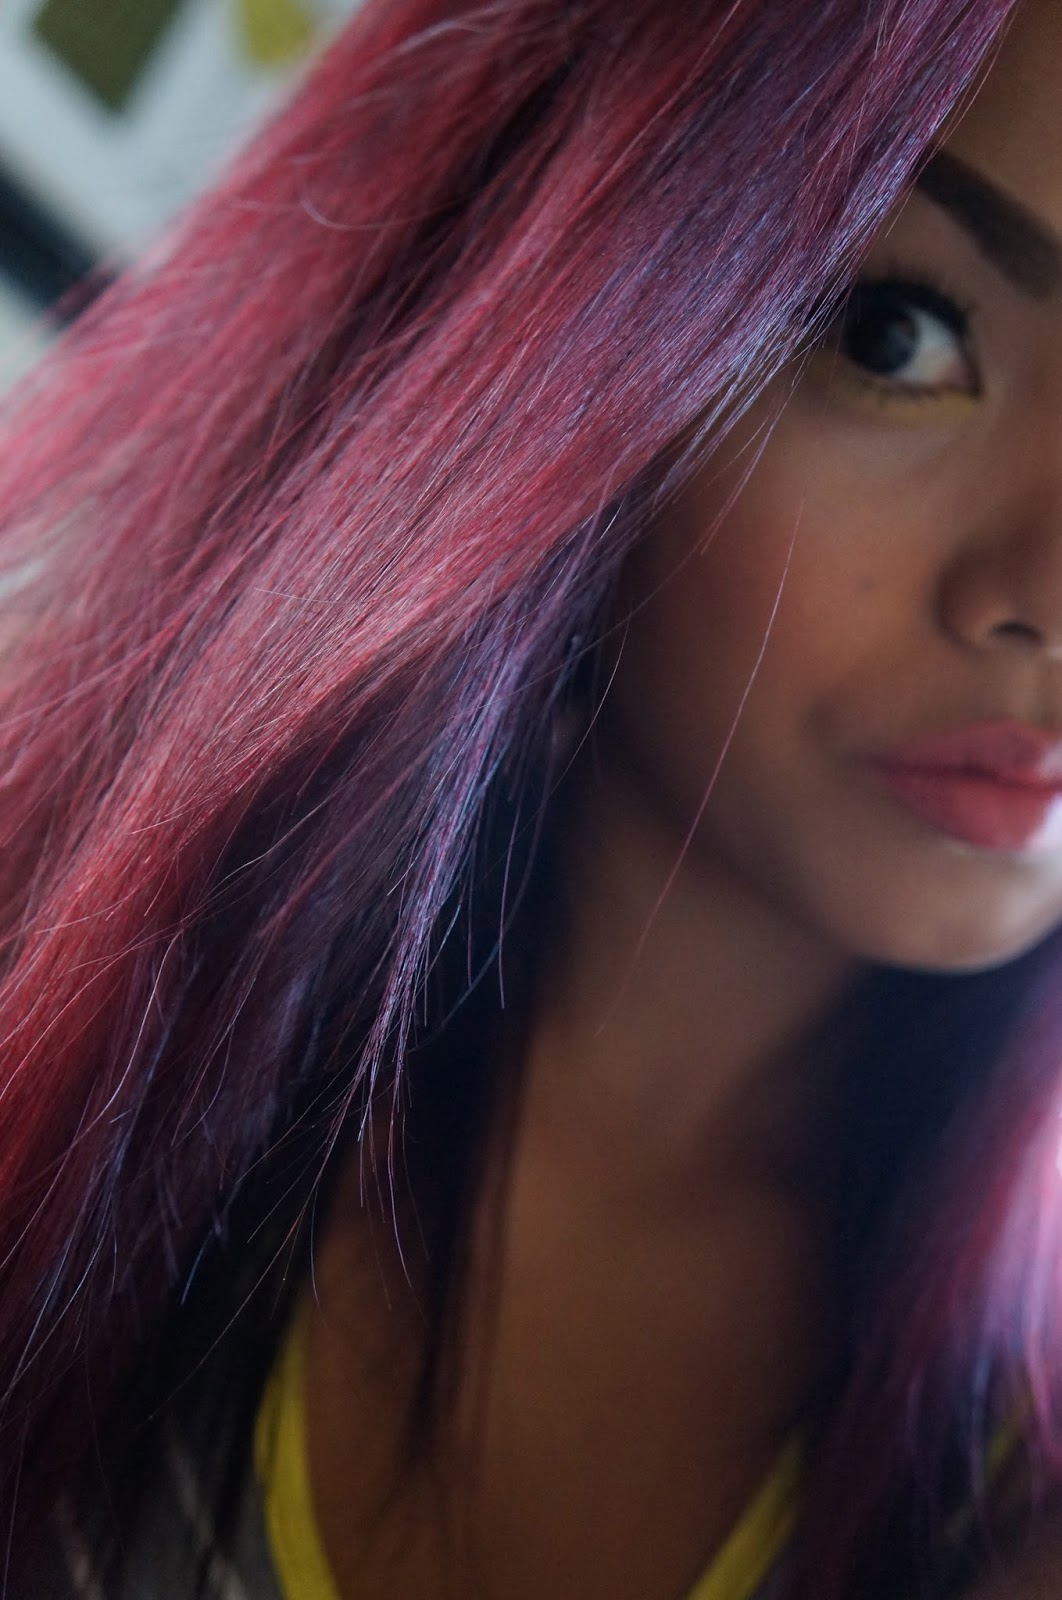 Teaseblendglam BeautyFashionDIY Ampamp More MY Burgundy  Plum Hair